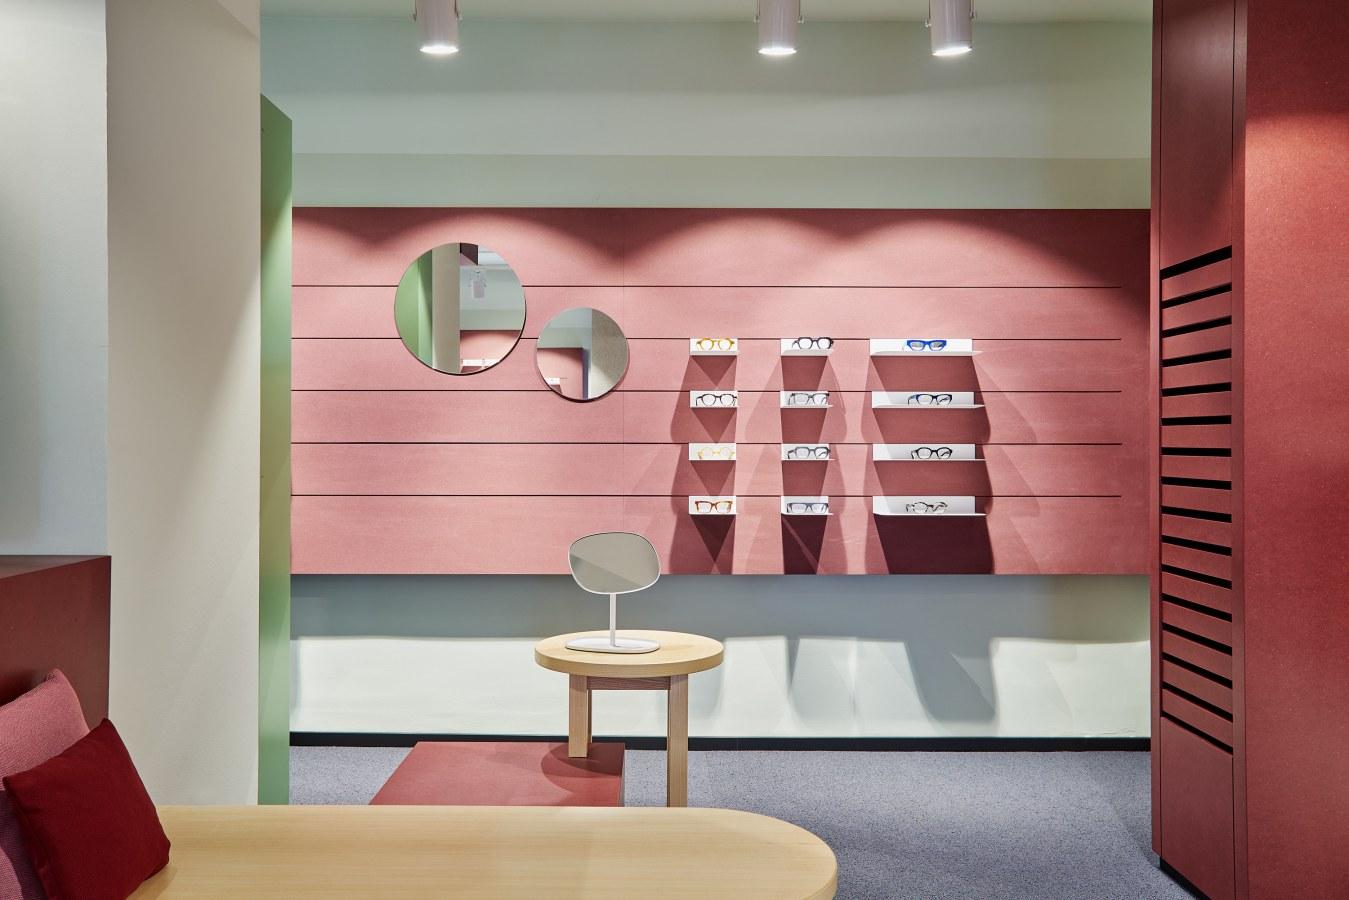 Isabell-Ehring-Innenarchitektur-Stuttgart---Umbau Ladenfläche-OPPENLÄNDEROPTIK-17.jpg